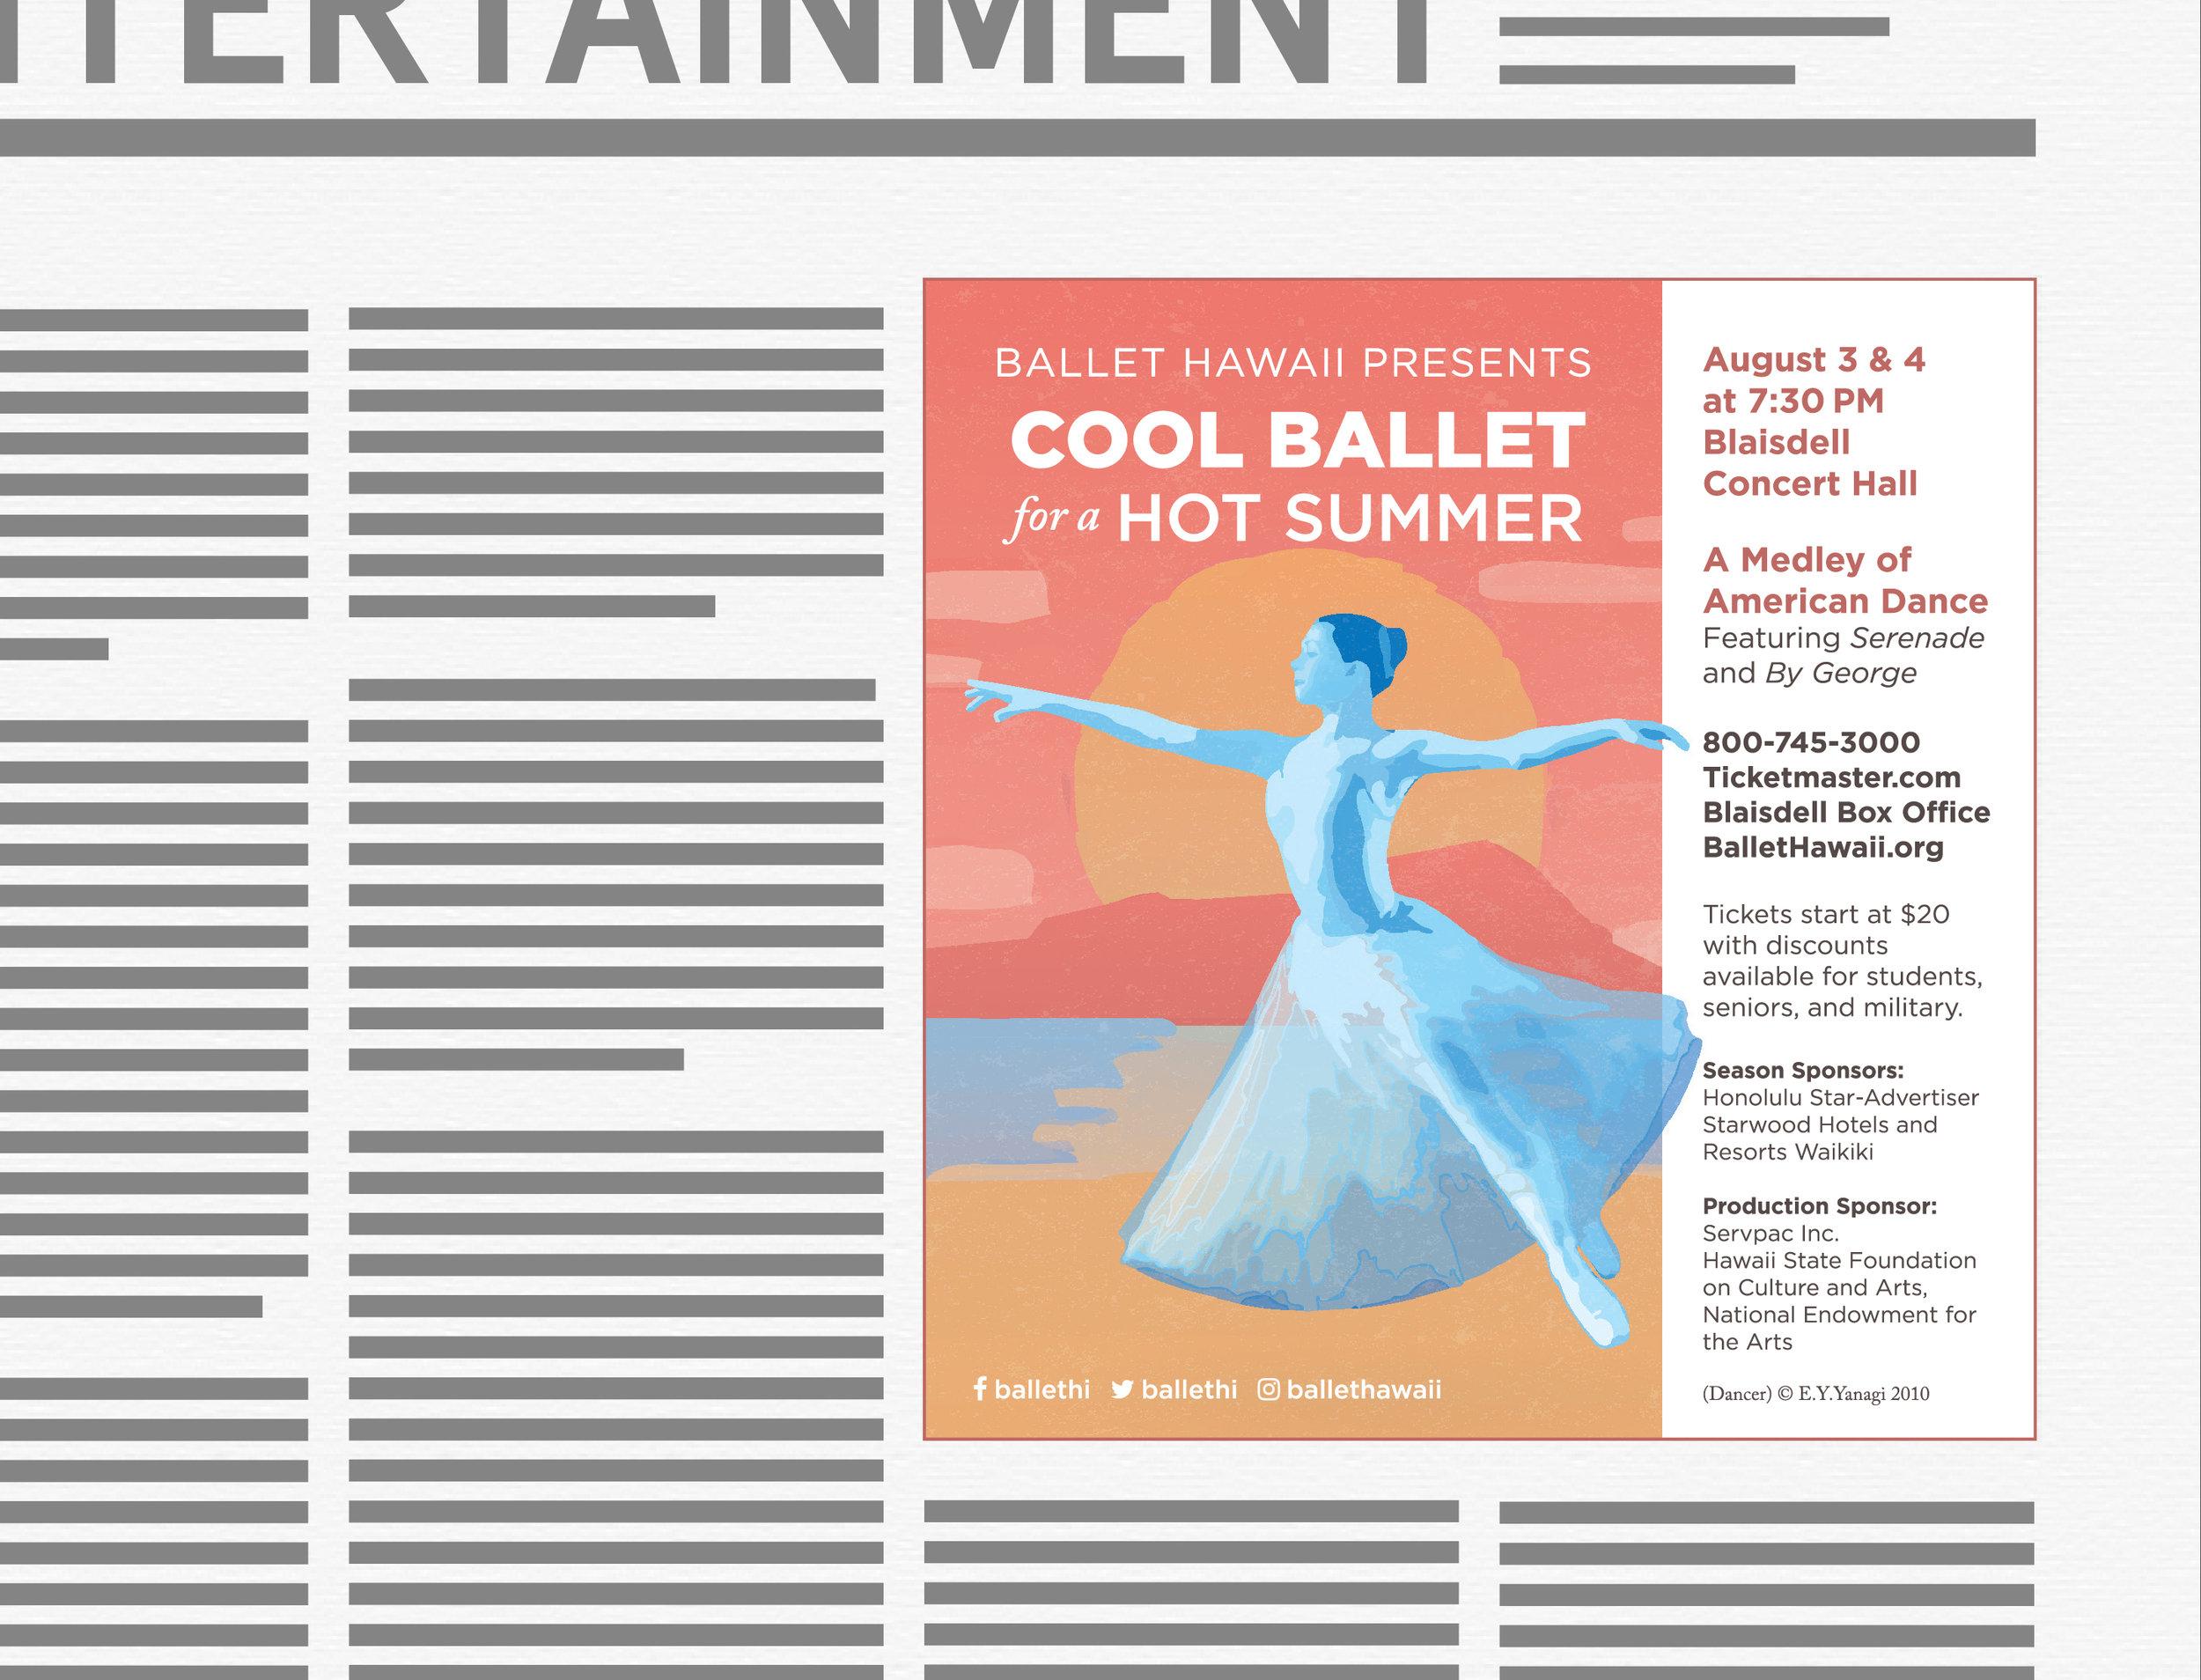 Cool_Ballet_Ad-01 copy.jpg